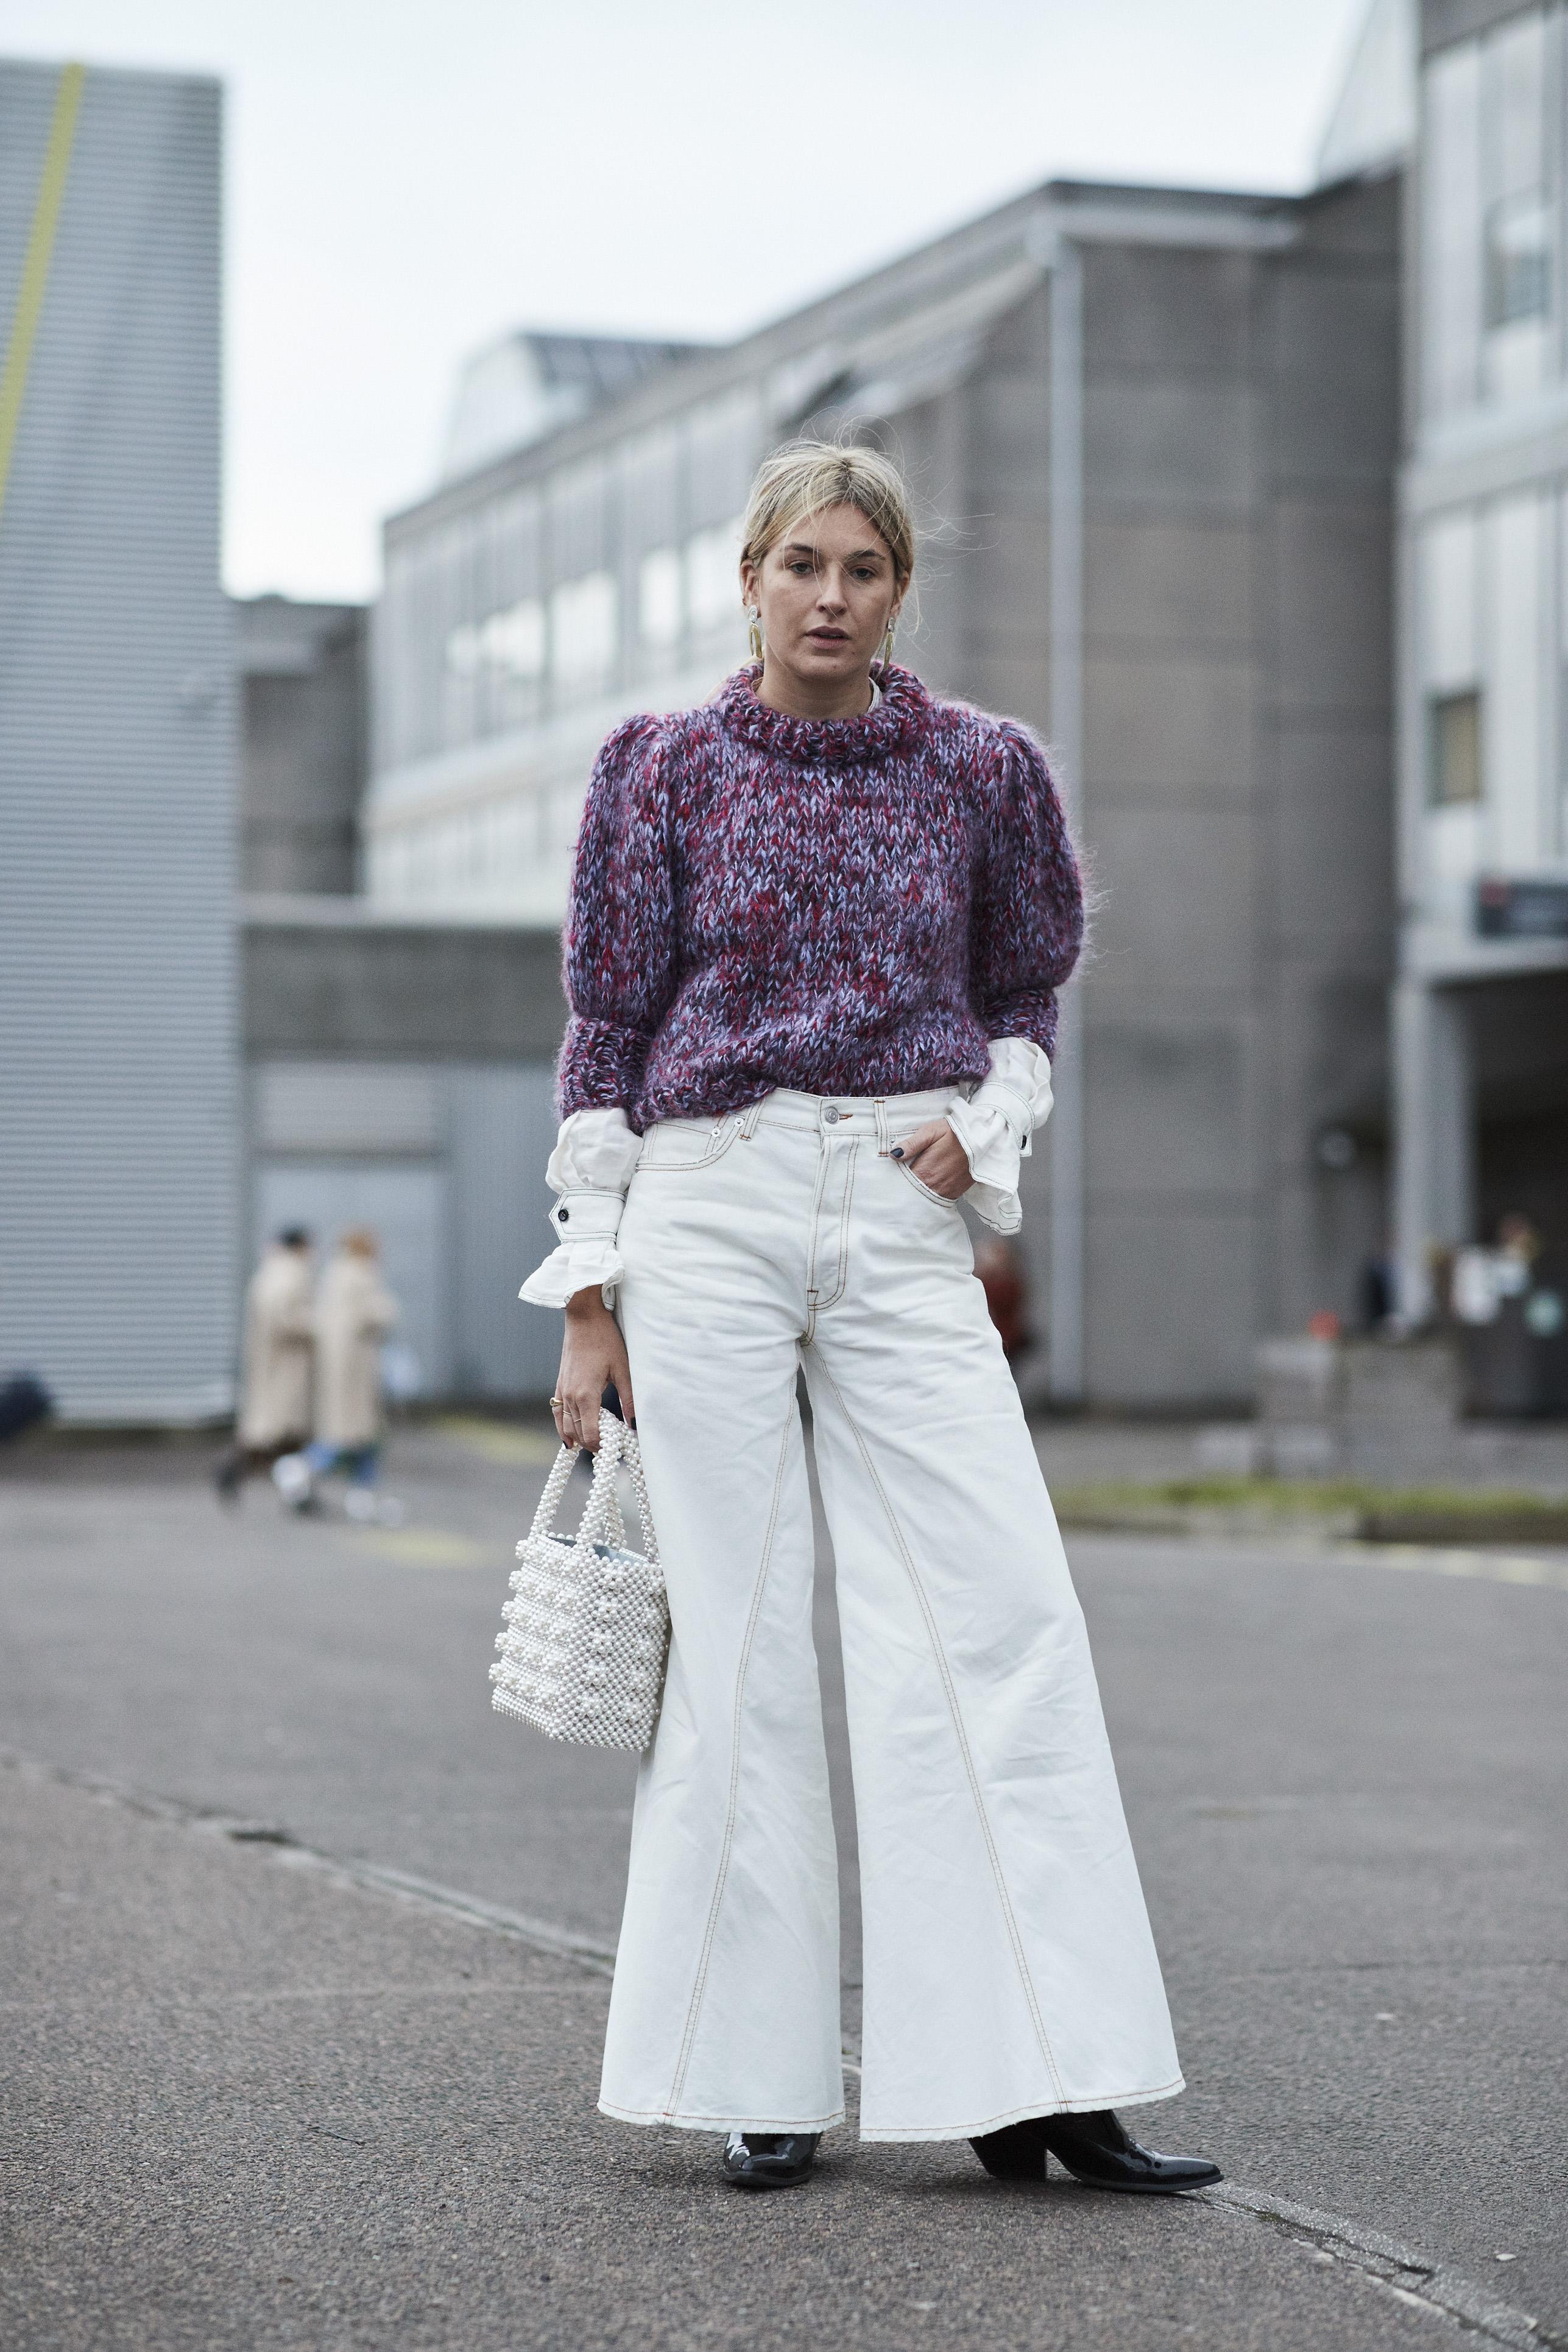 6a036ab04b5a Winter White  Πώς να φορέσεις το λευκό χρώμα και τον χειμώνα - LAIF